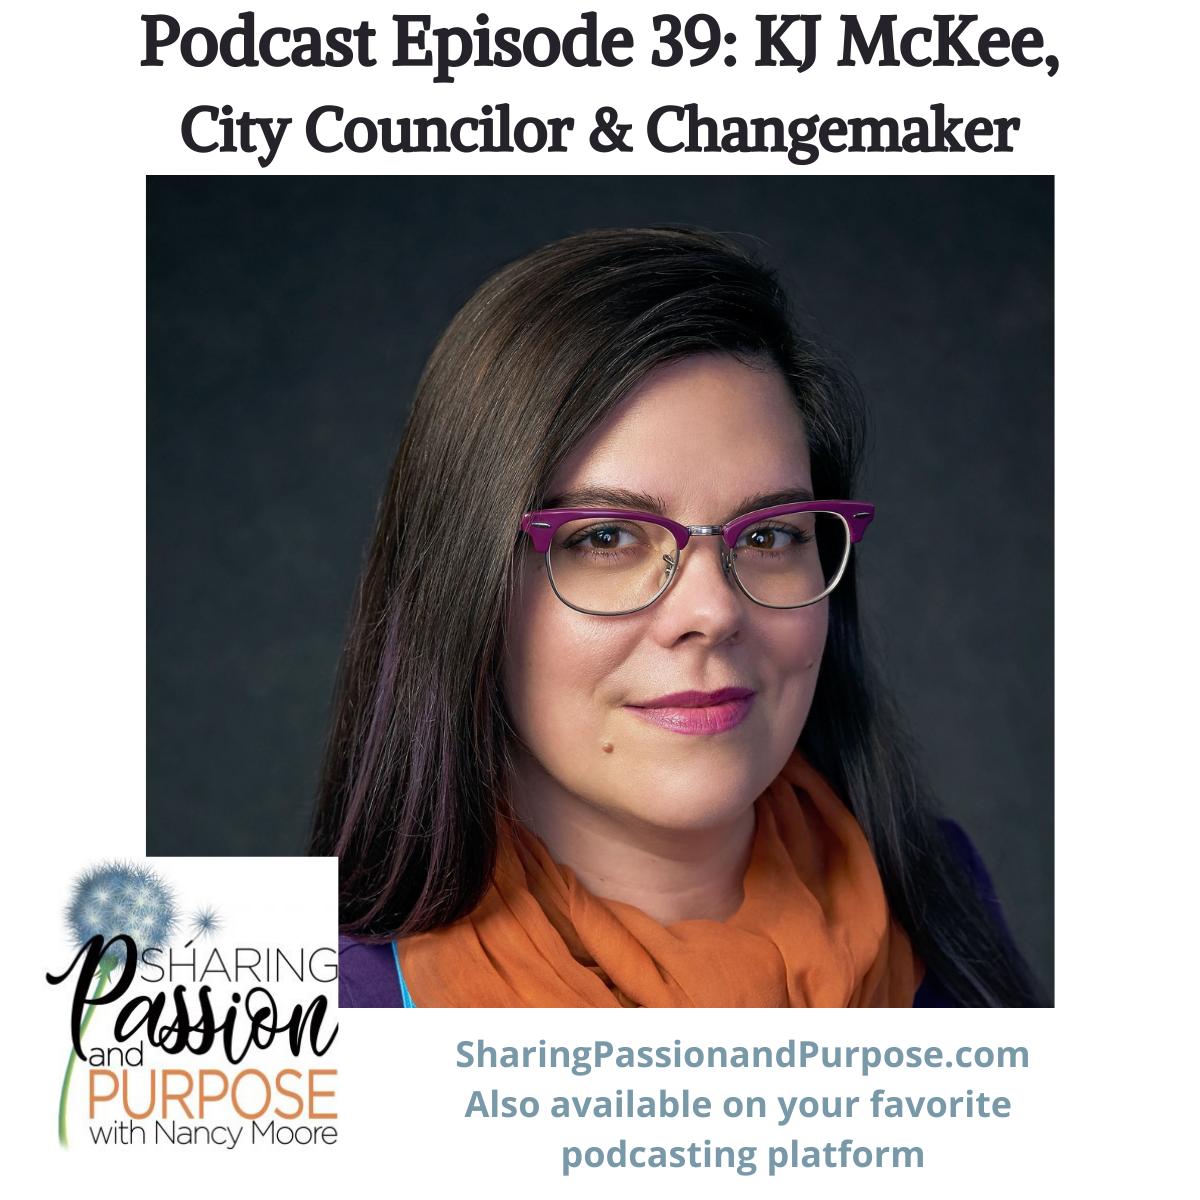 KJ McKee, Tulsa City Councilor and Changemaker